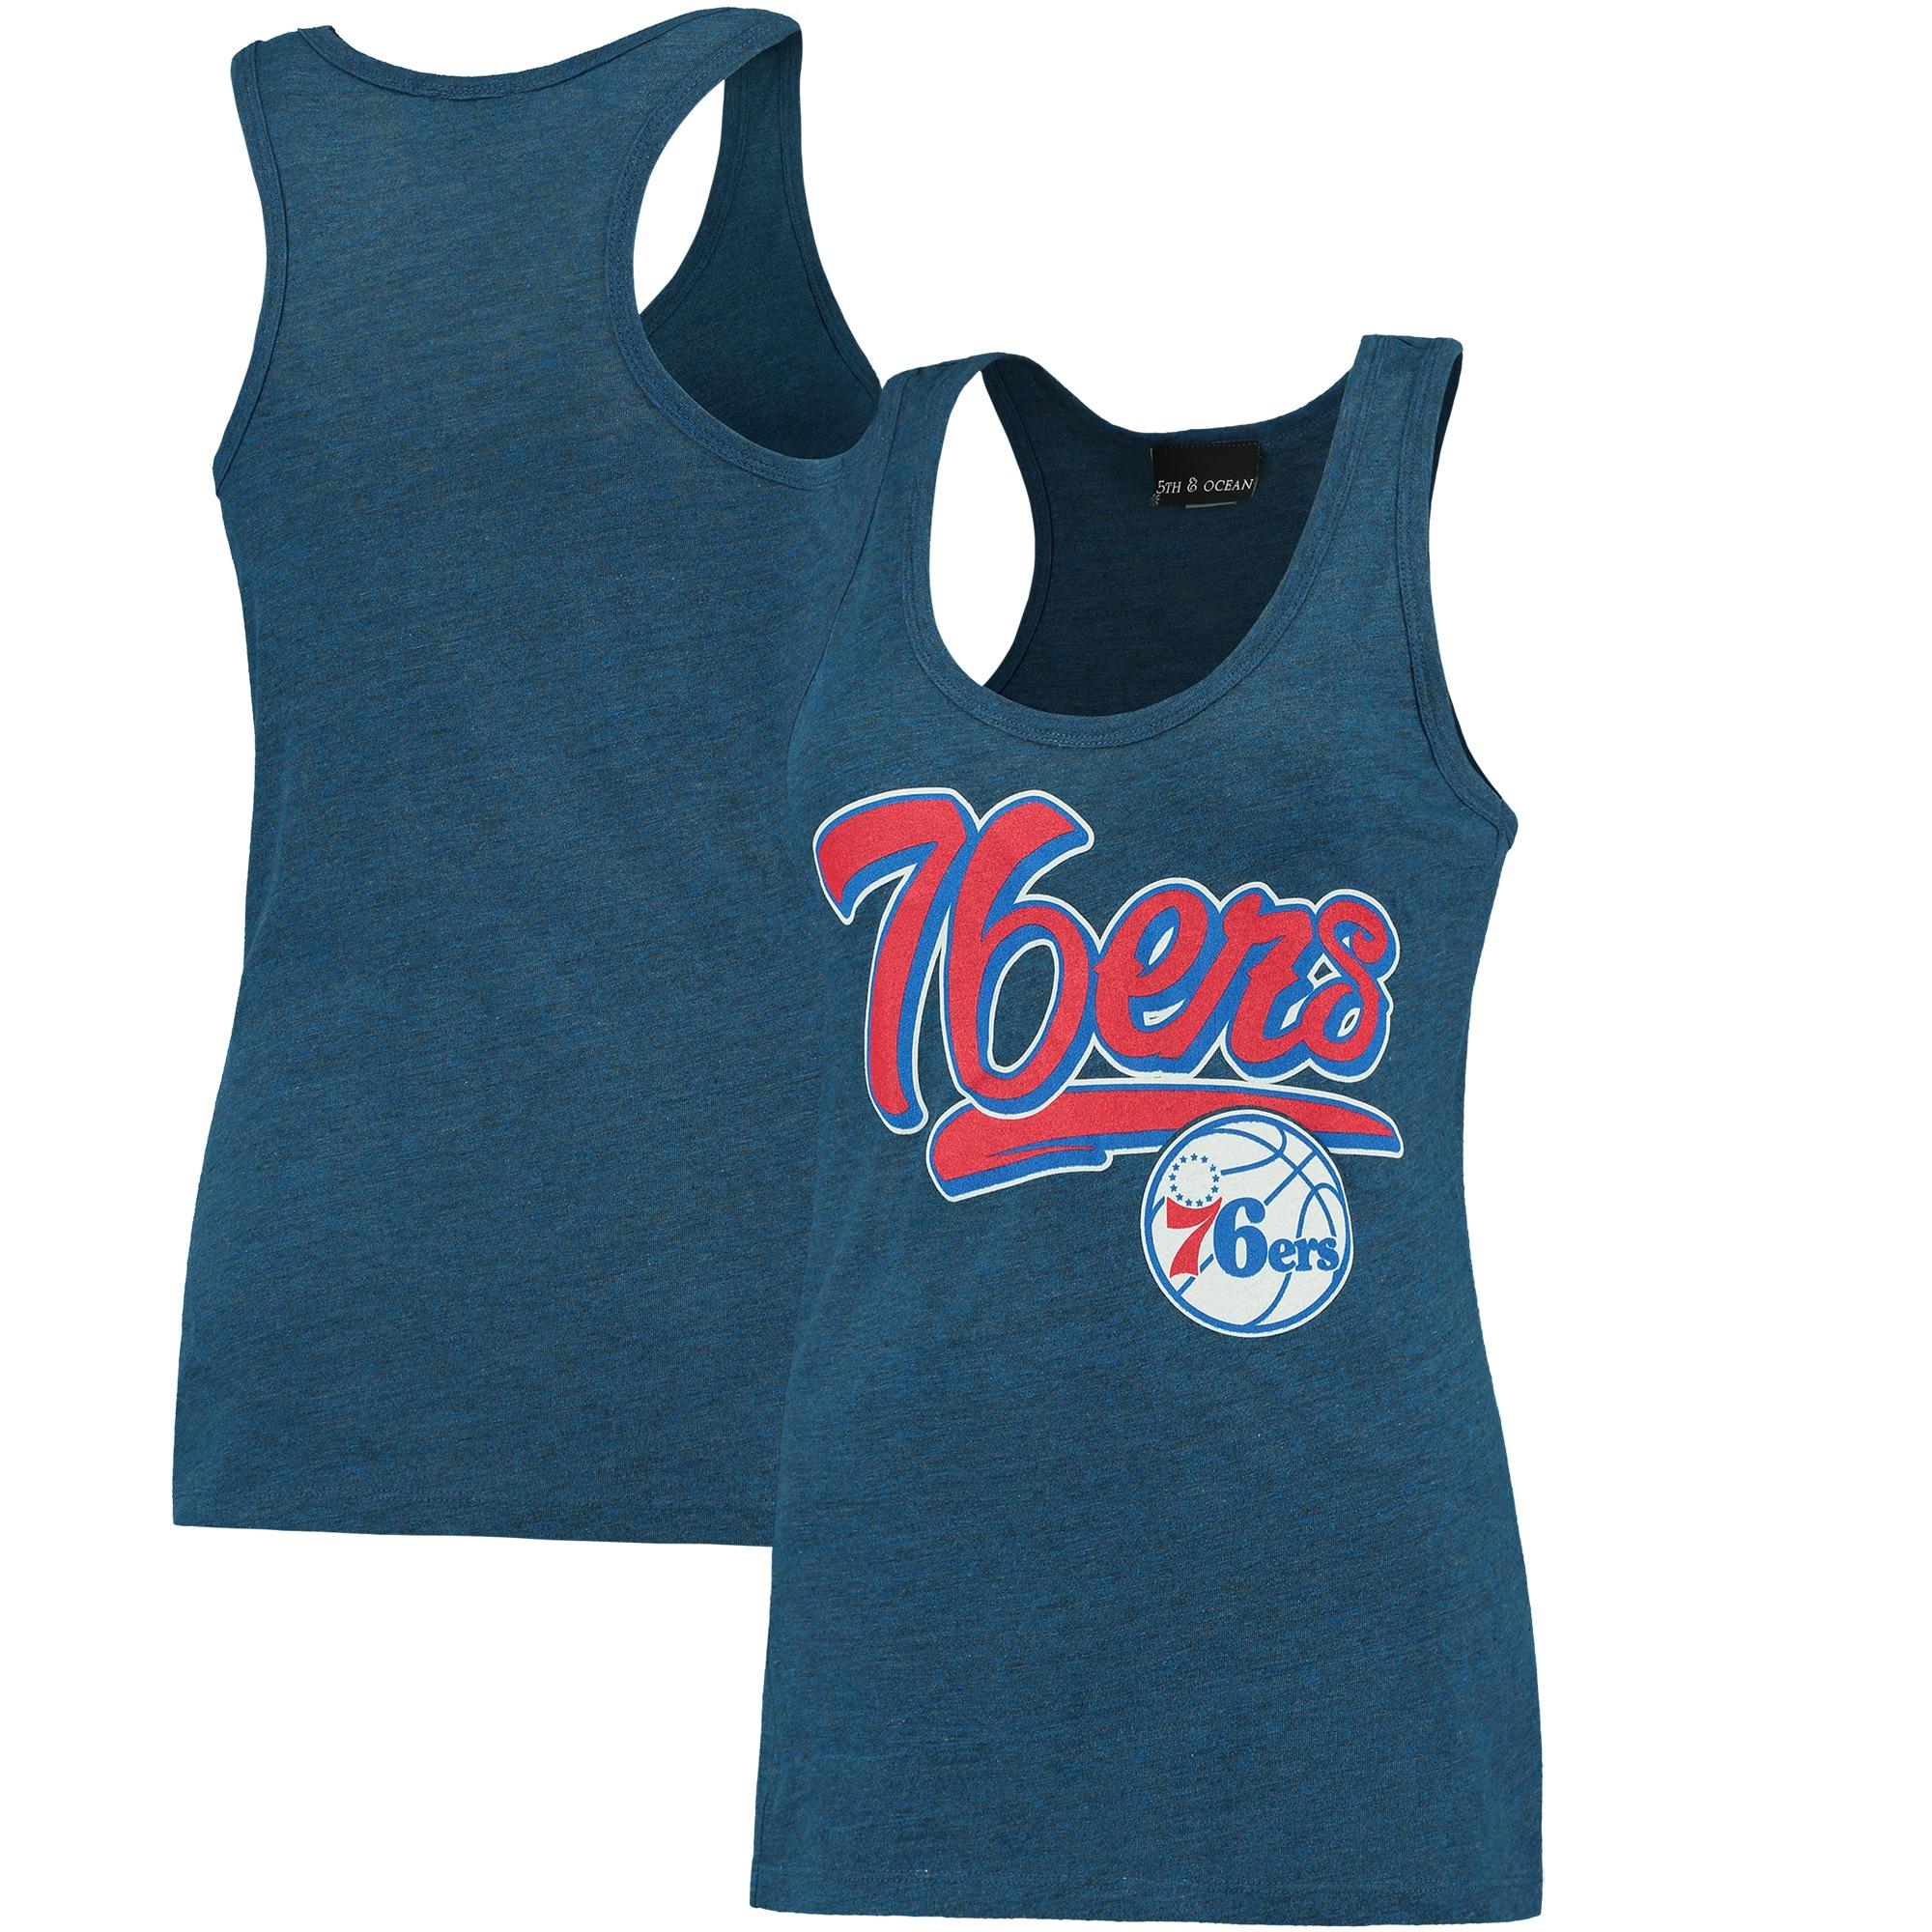 Philadelphia 76ers New Era Women's Tri-Blend Tank Top - Heathered Royal